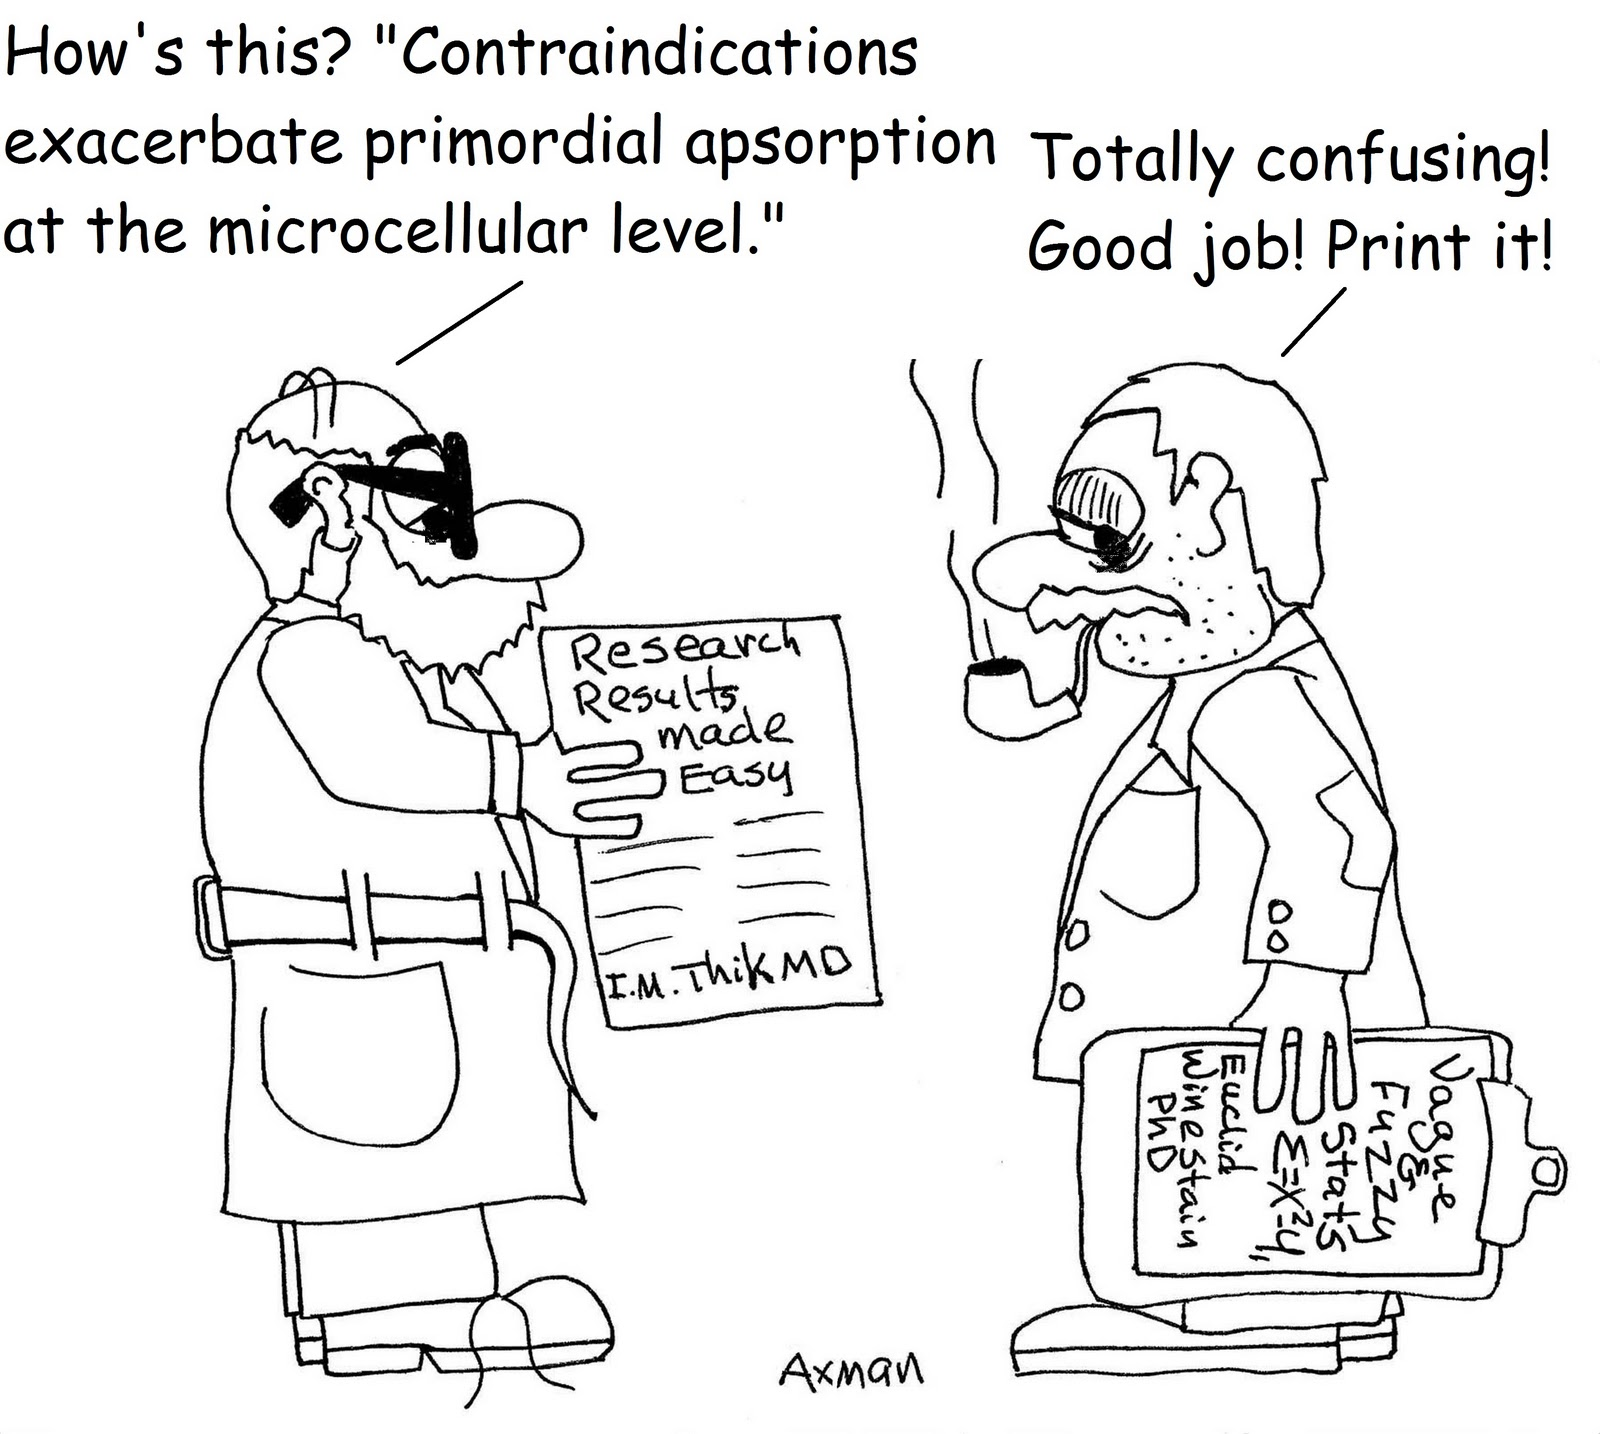 Cancer Clinical Trials: Clinical Trials in Cartoons